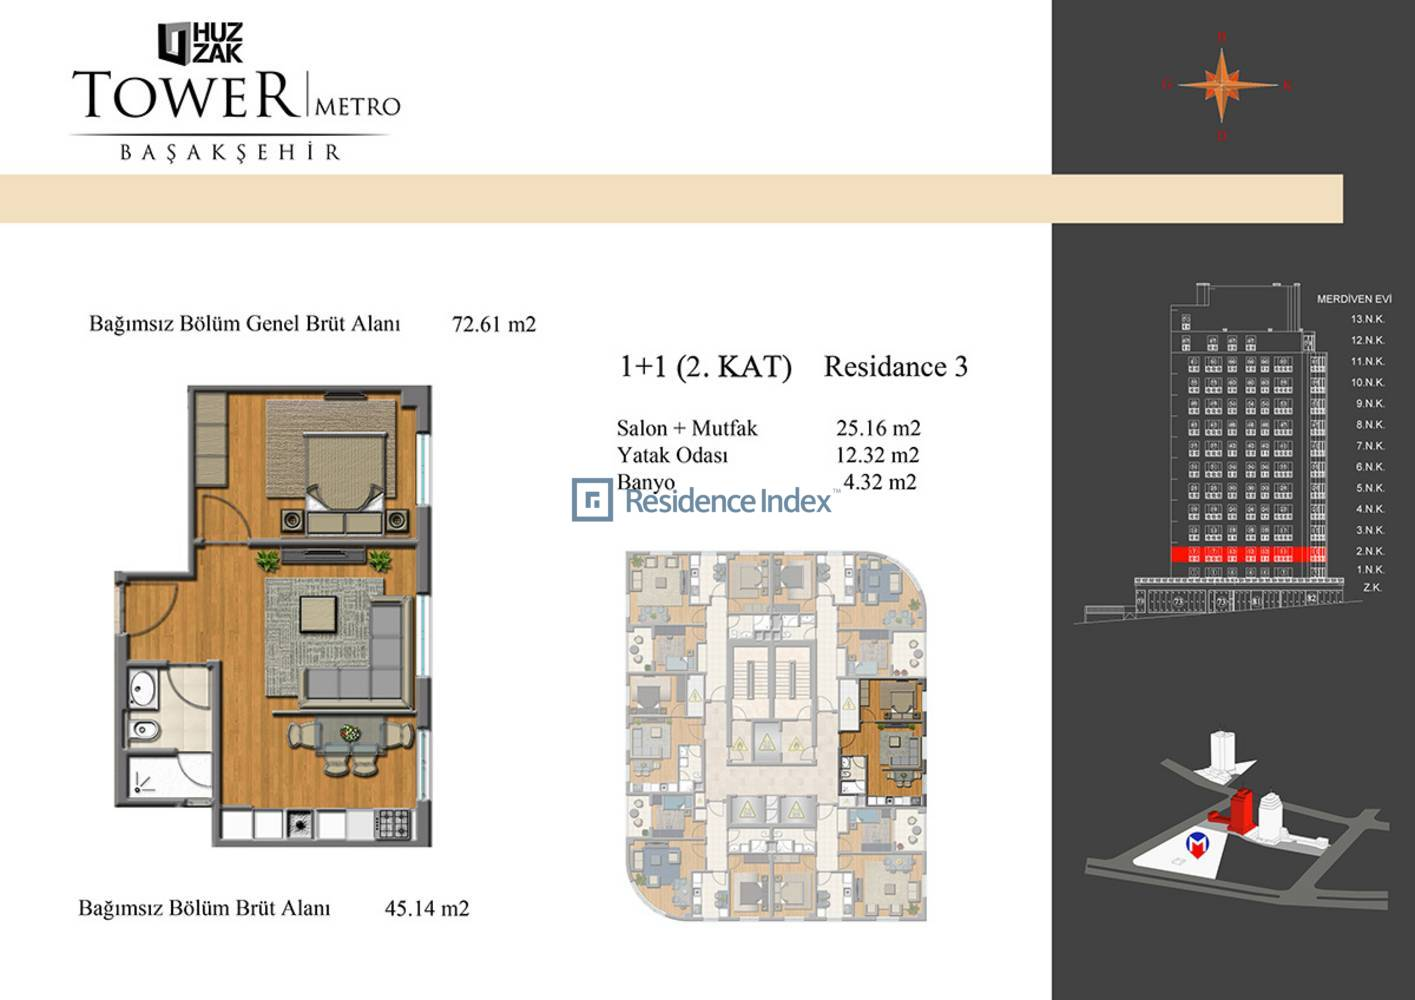 Huzzak Tower Metro Residence 3